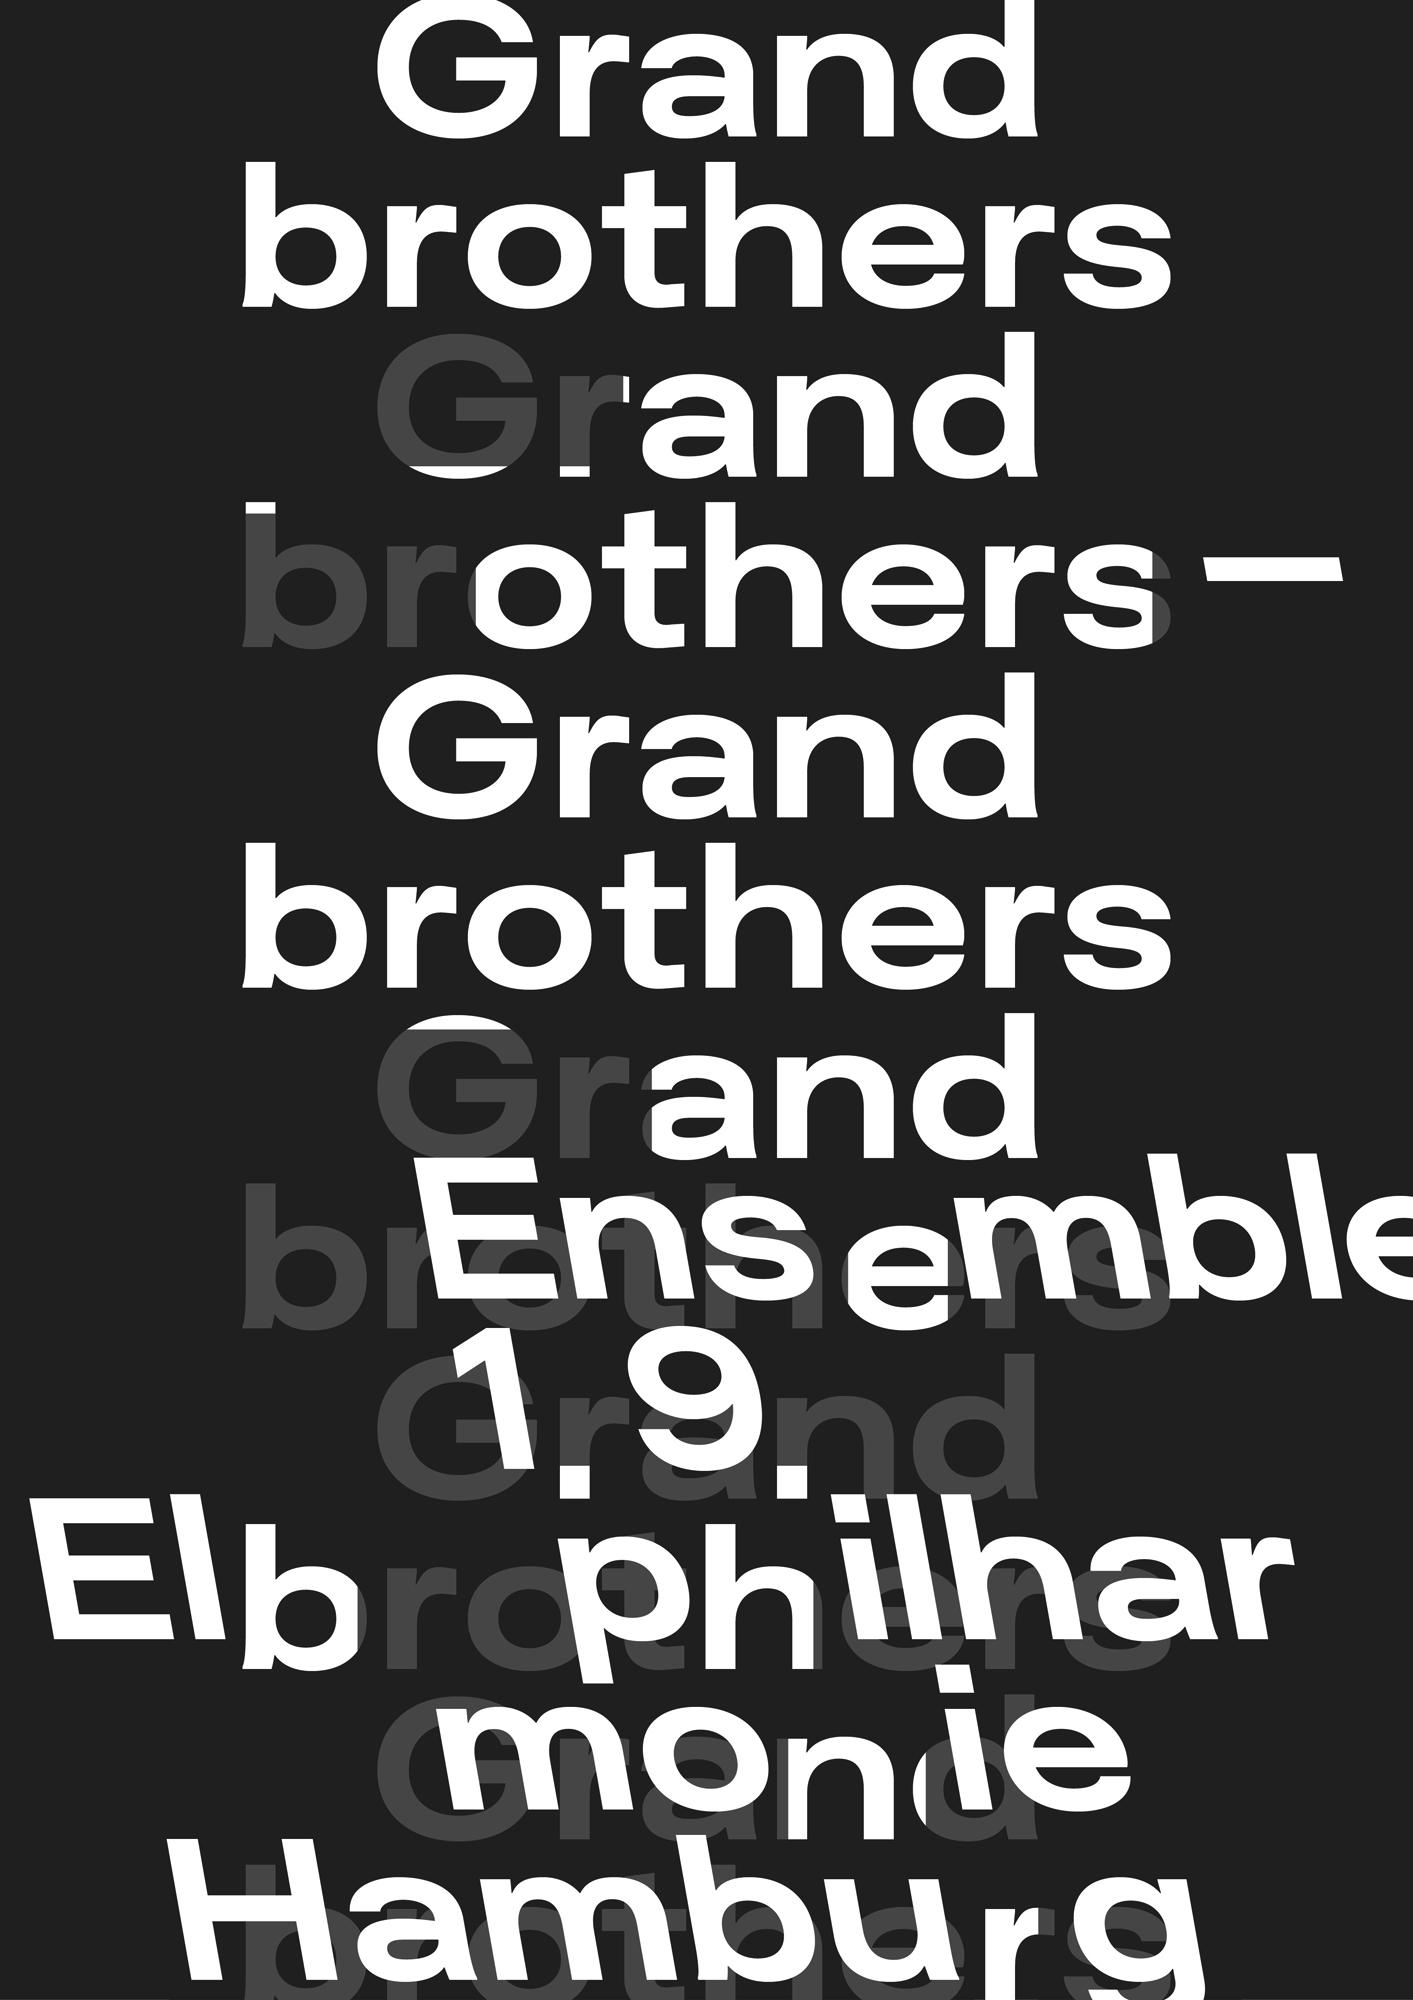 zwoelf_grandbrothers_and_others_1_9_19_elbphilharmonie_RGB_2000px_20190510.jpg